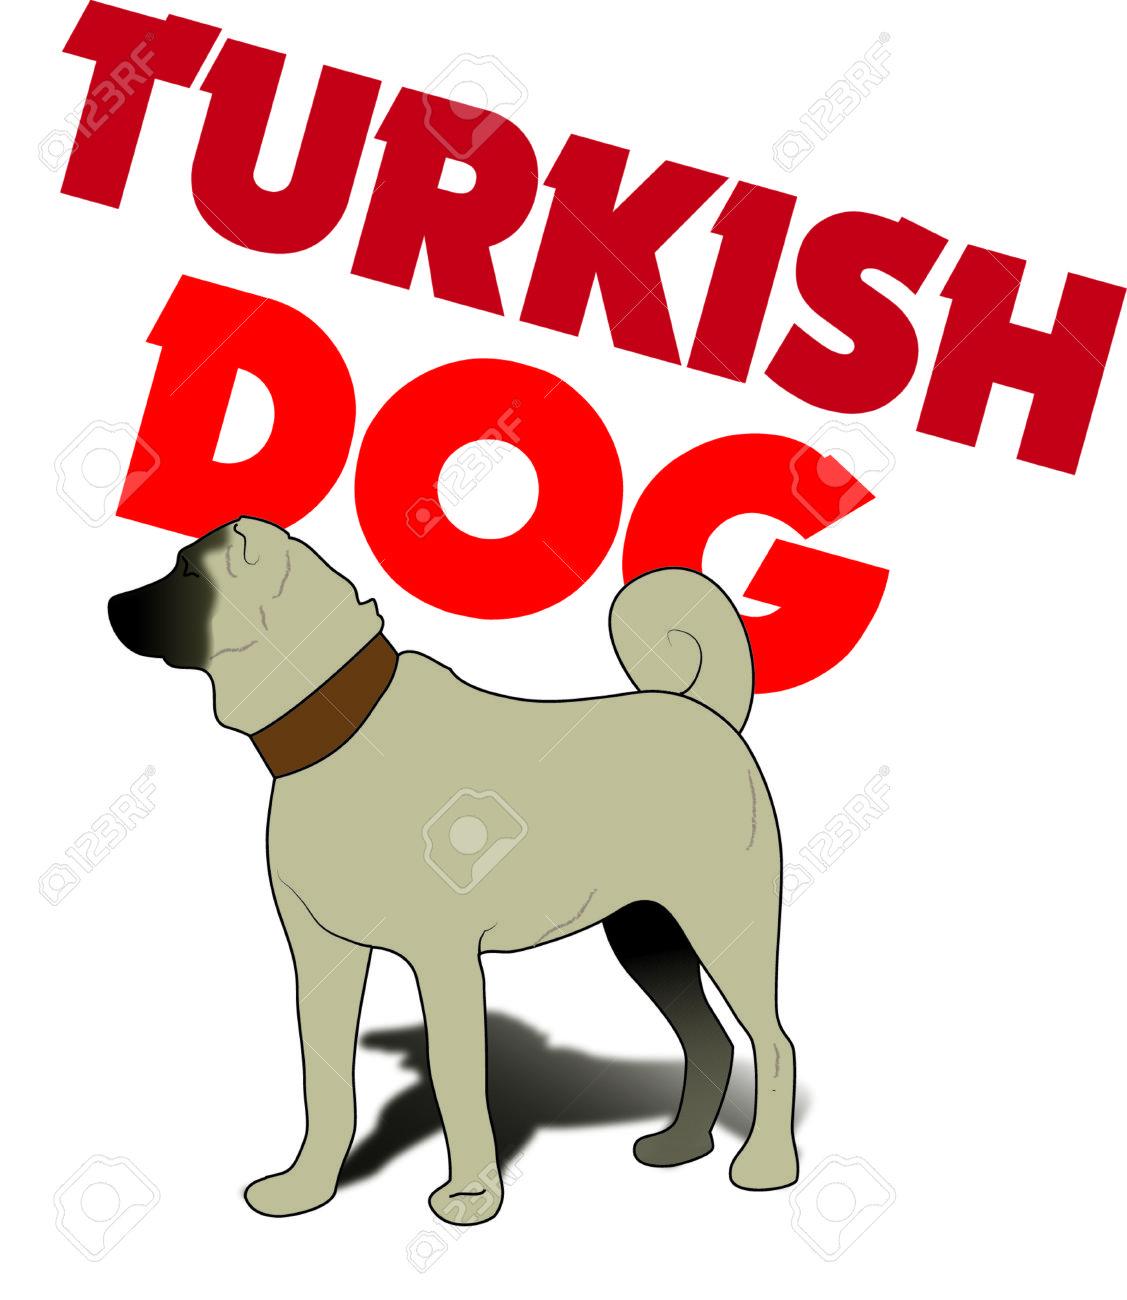 Kangal Dog clipart #4, Download drawings